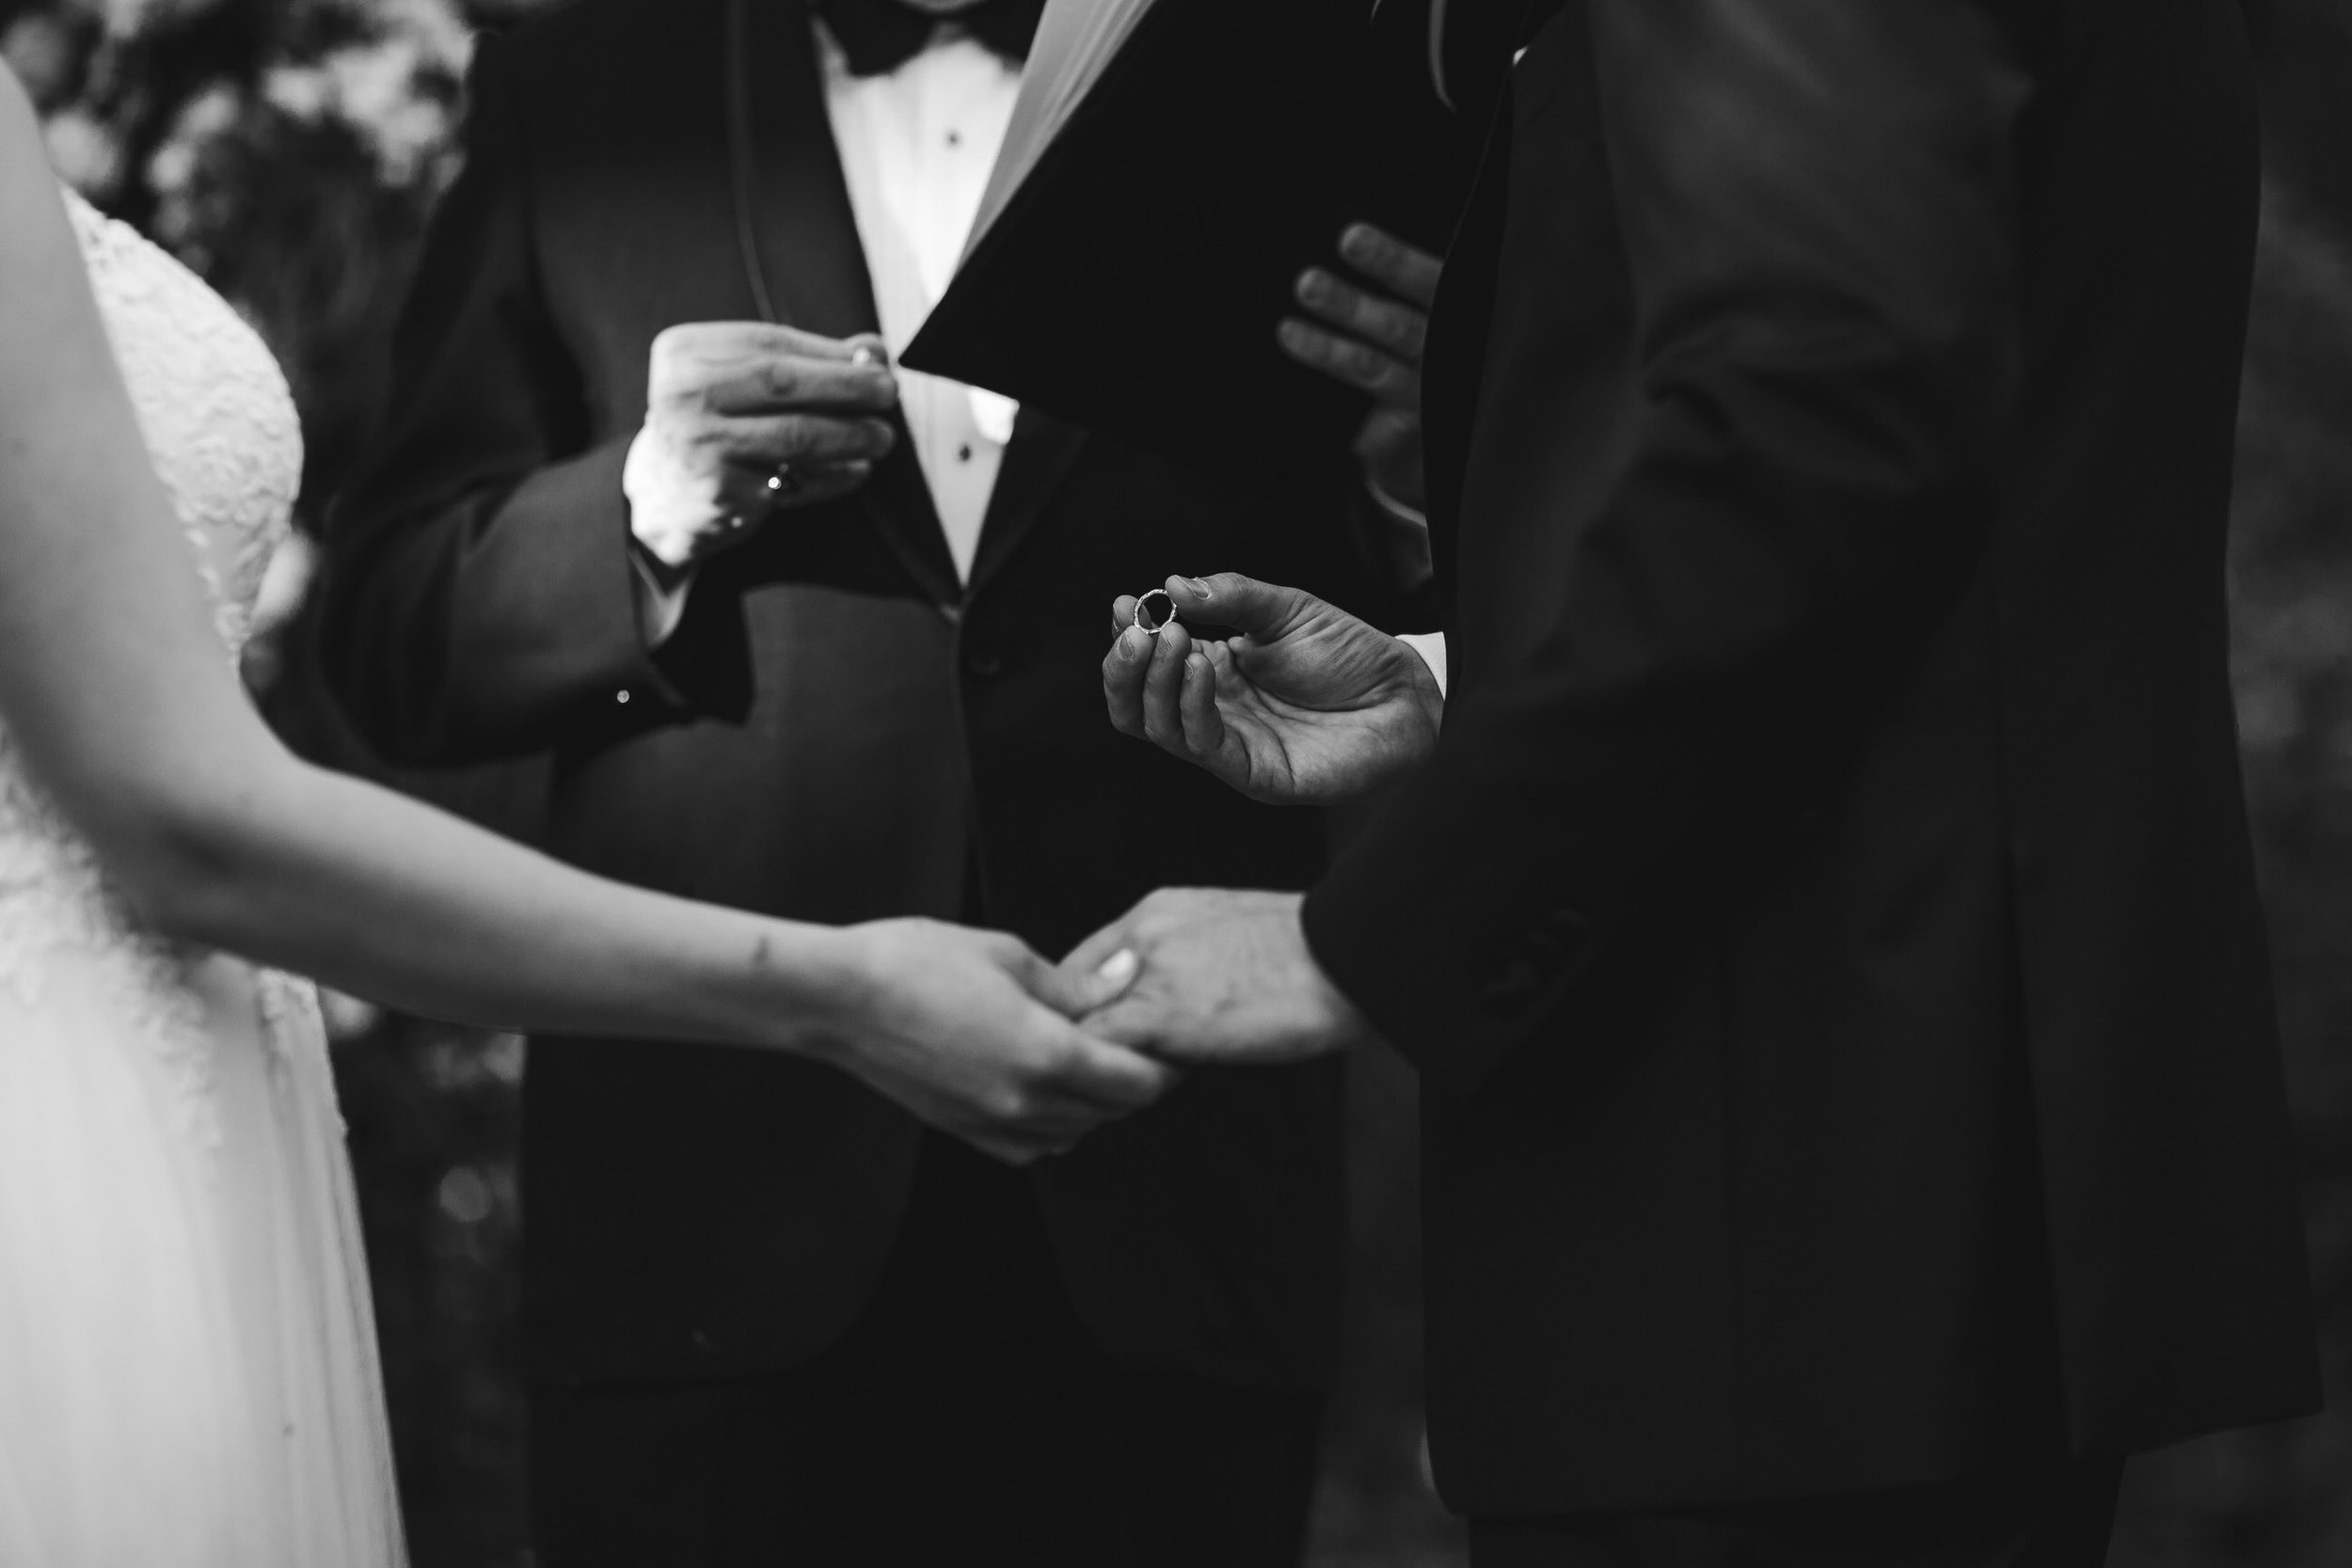 exchange_rings_tiny_house_photo_wedding_ceremony_black_and_white.jpg